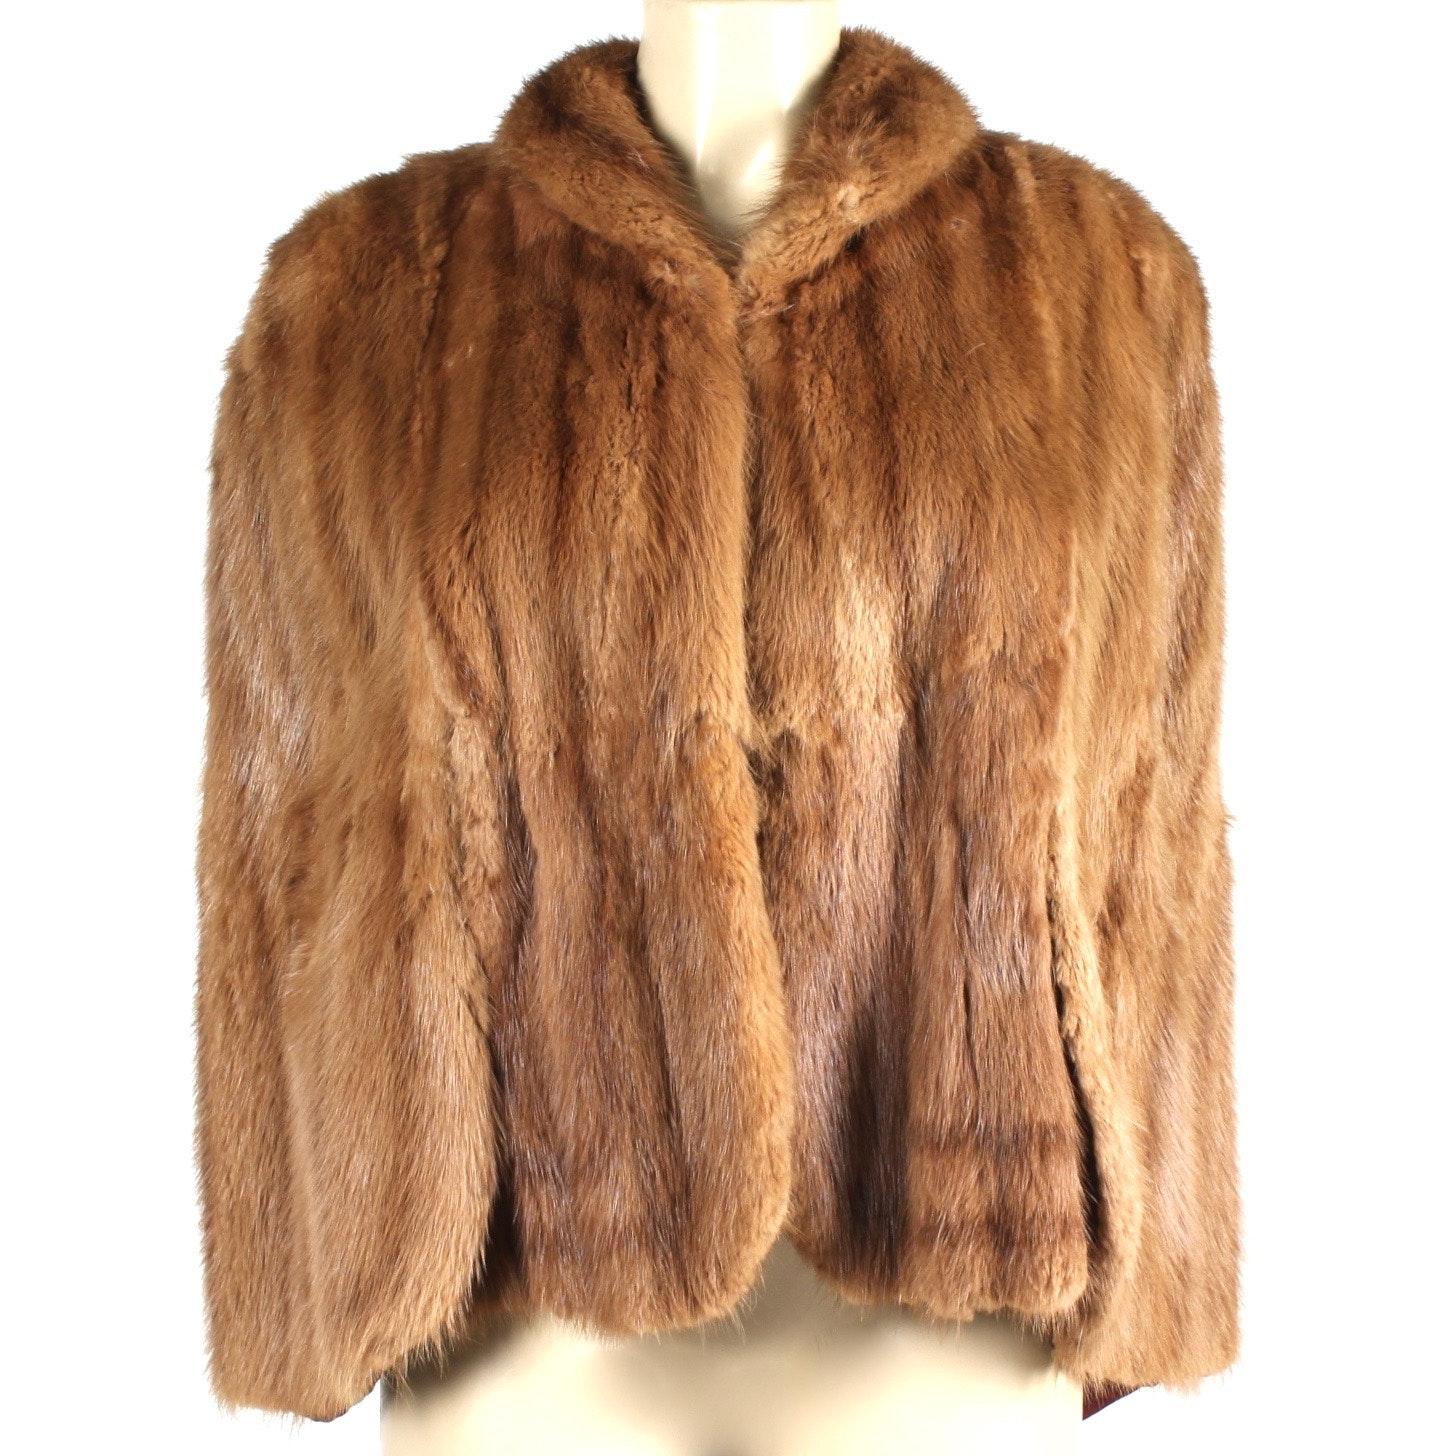 Vintage Mink Fur Cape From Livingston's